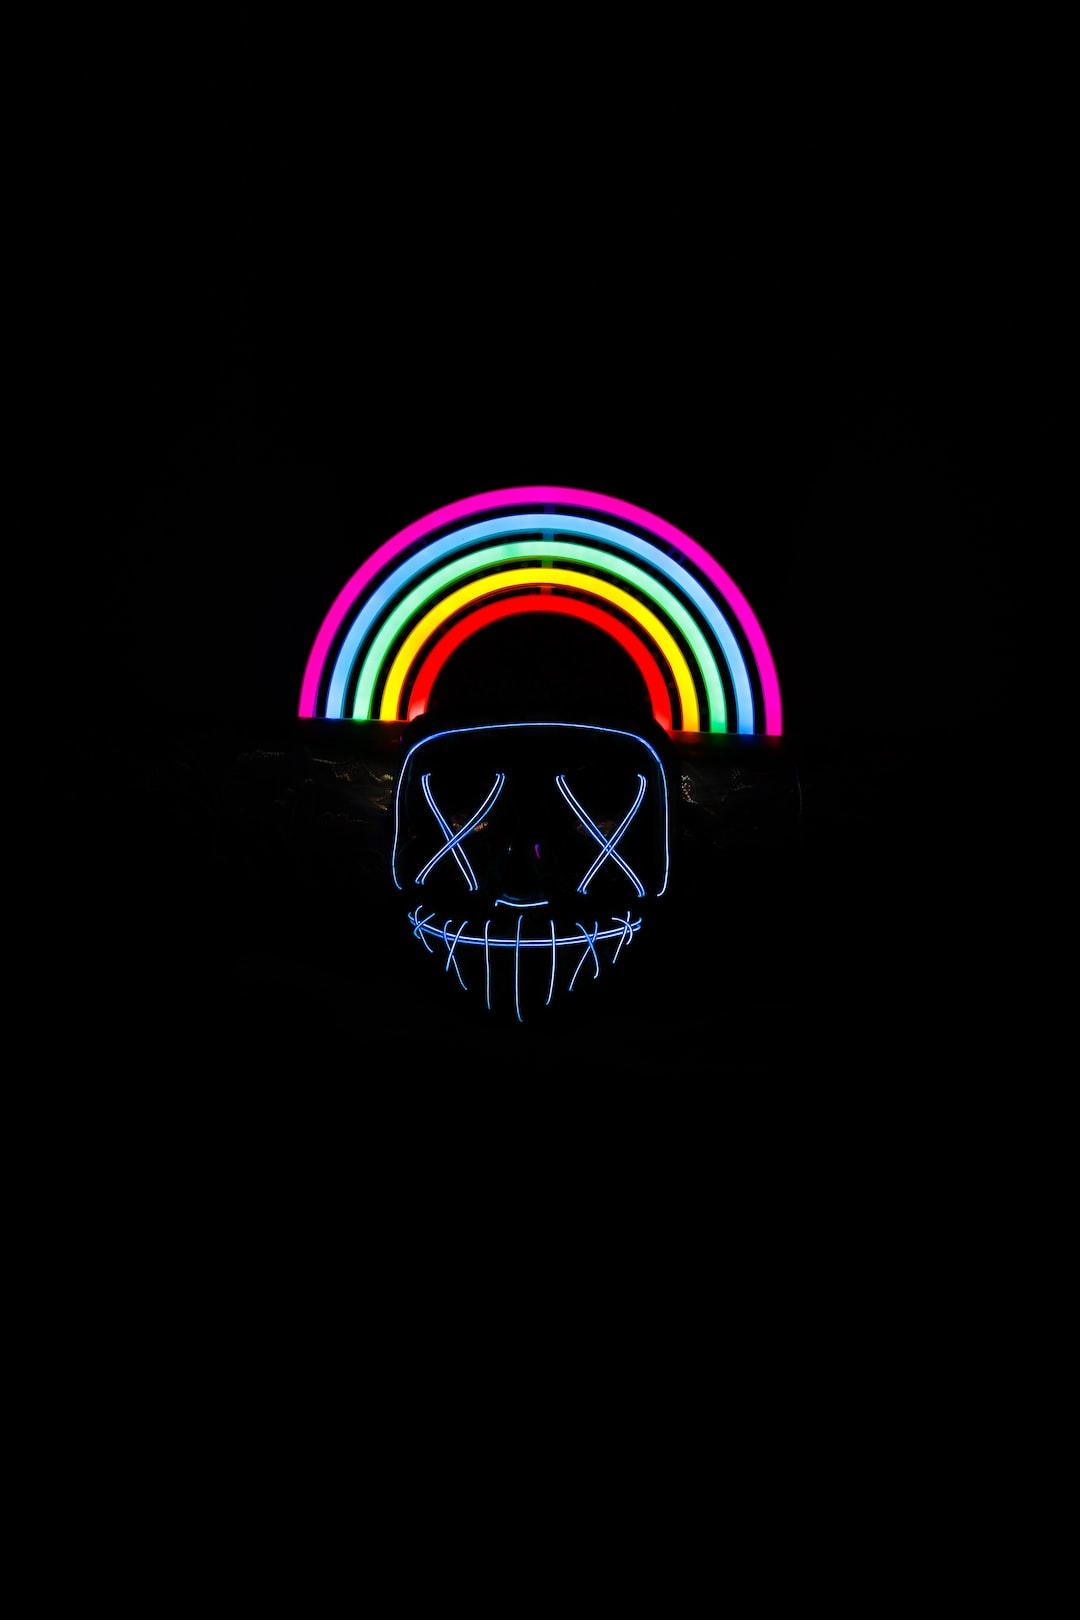 Halloween Purge Neon LED Mask and Neon Rainbow